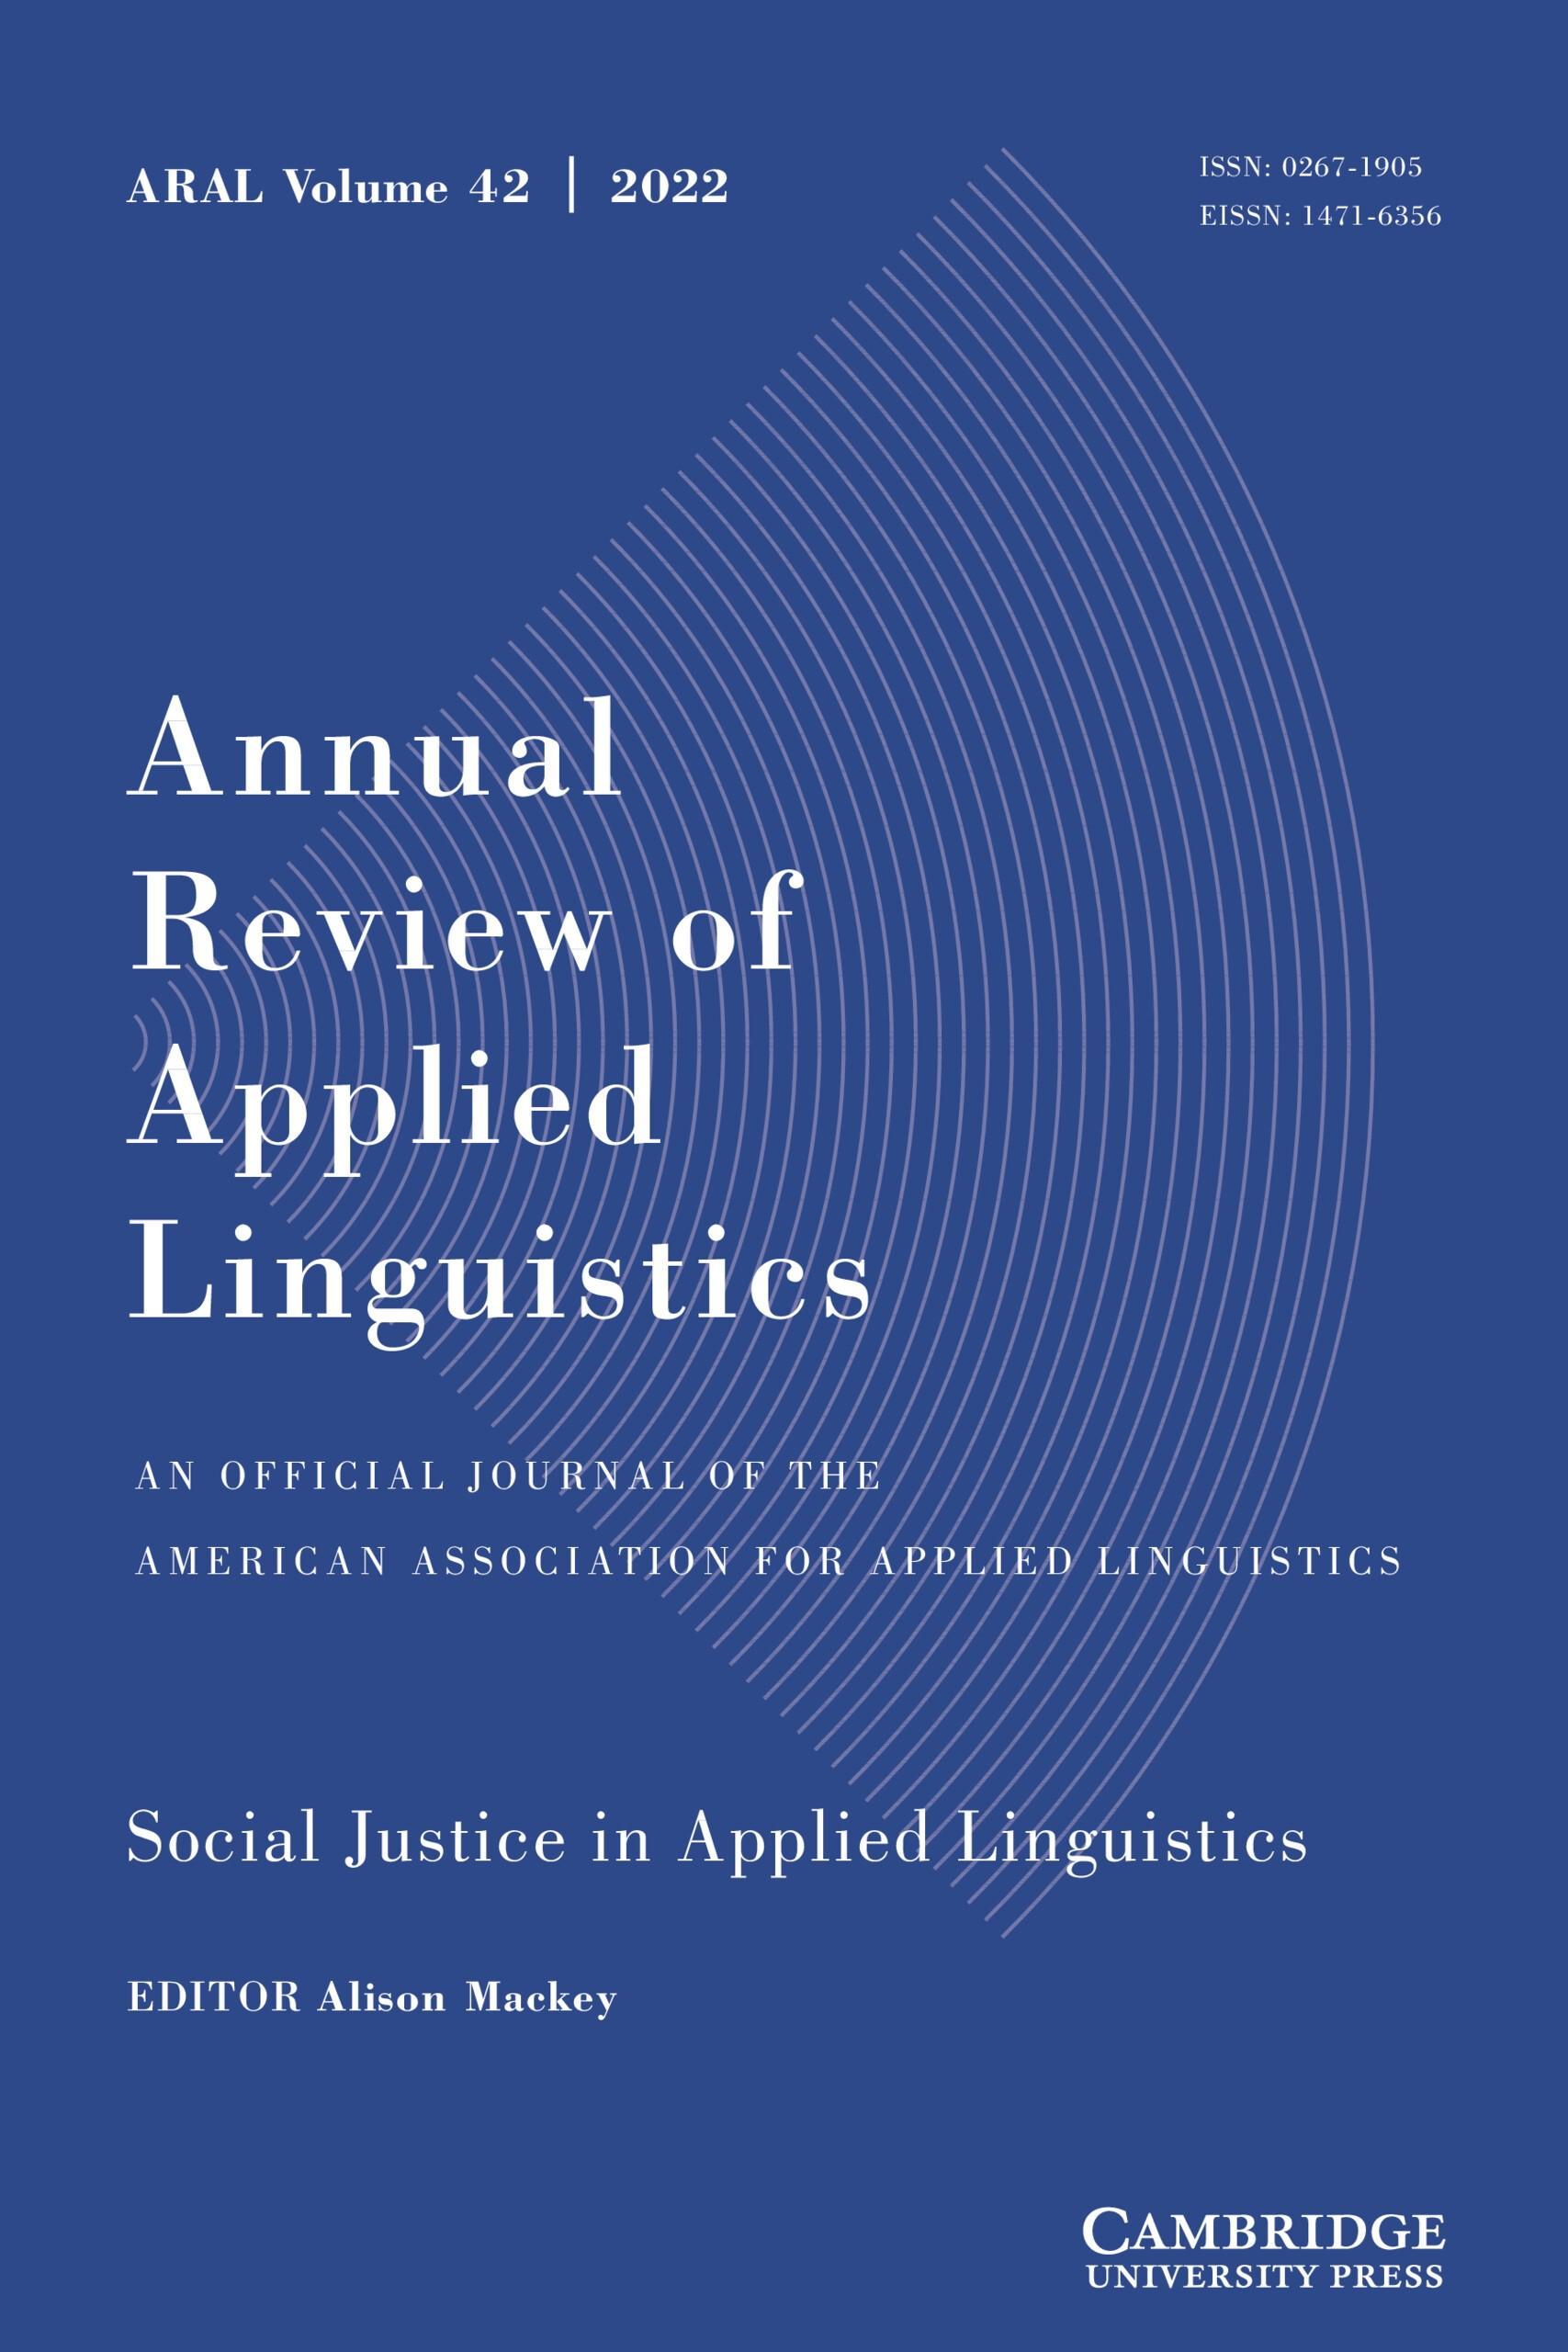 Study language 6th edition 6th edition | English language